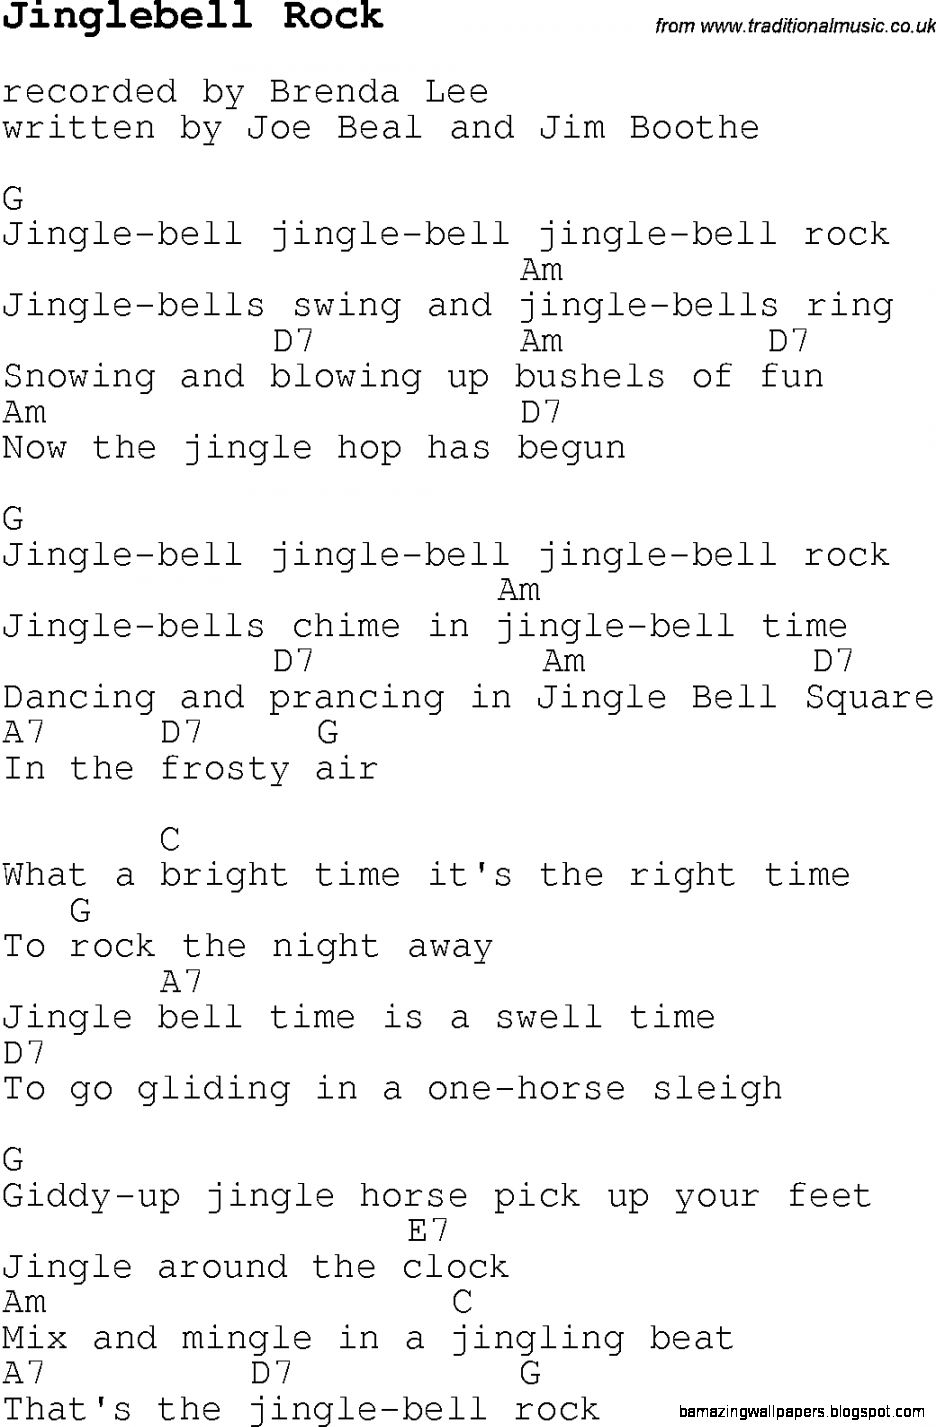 Christmas CarolSong lyrics with chords for Jinglebell Rock